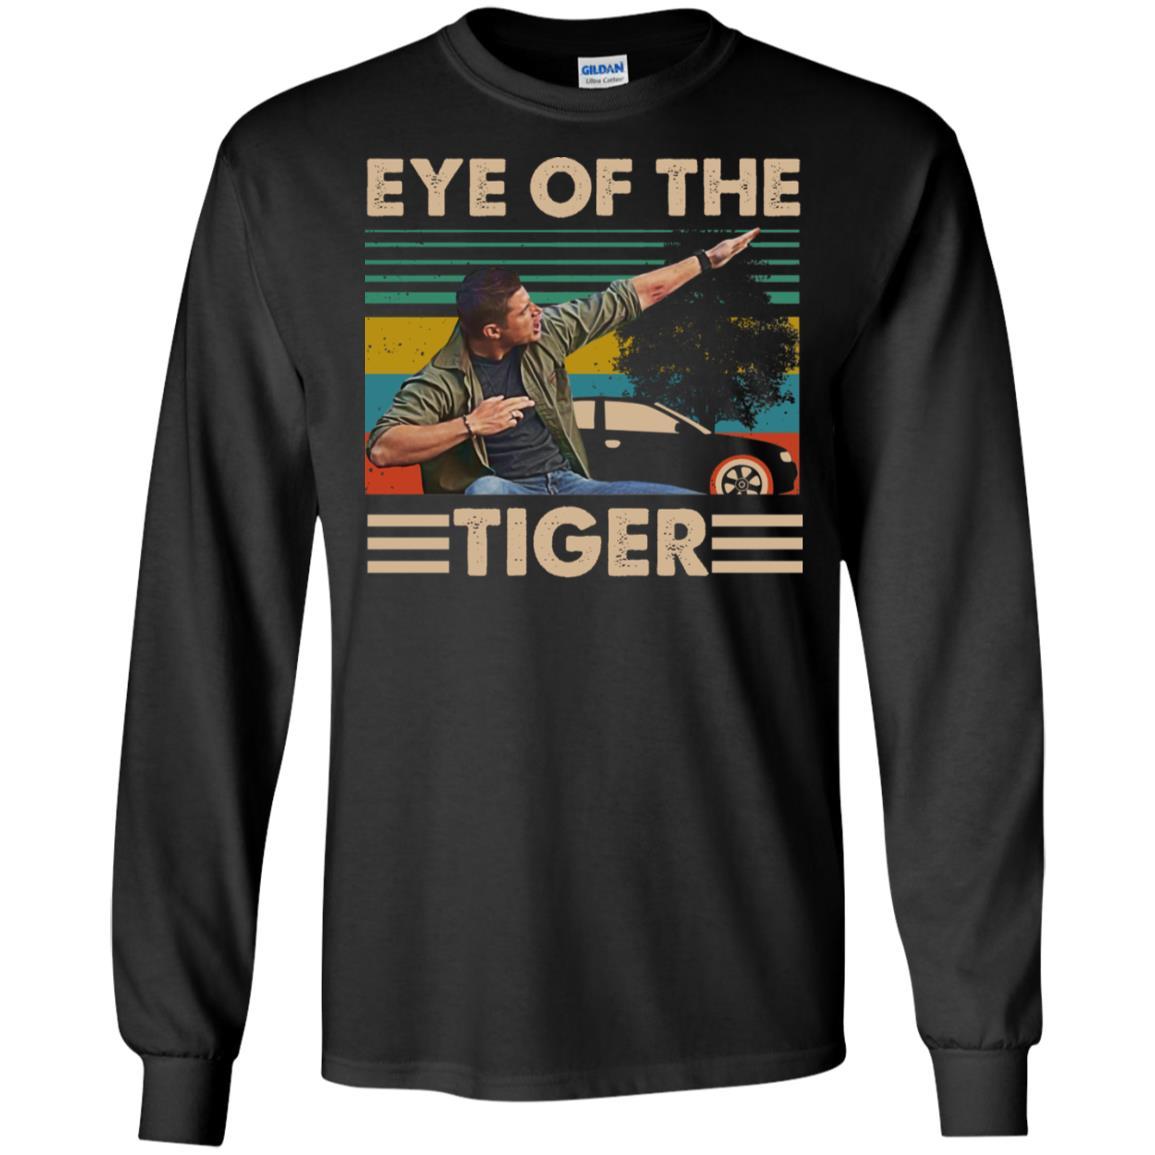 Supernatural Dean Eye of The Tiger Cotton T-Shirt for Men